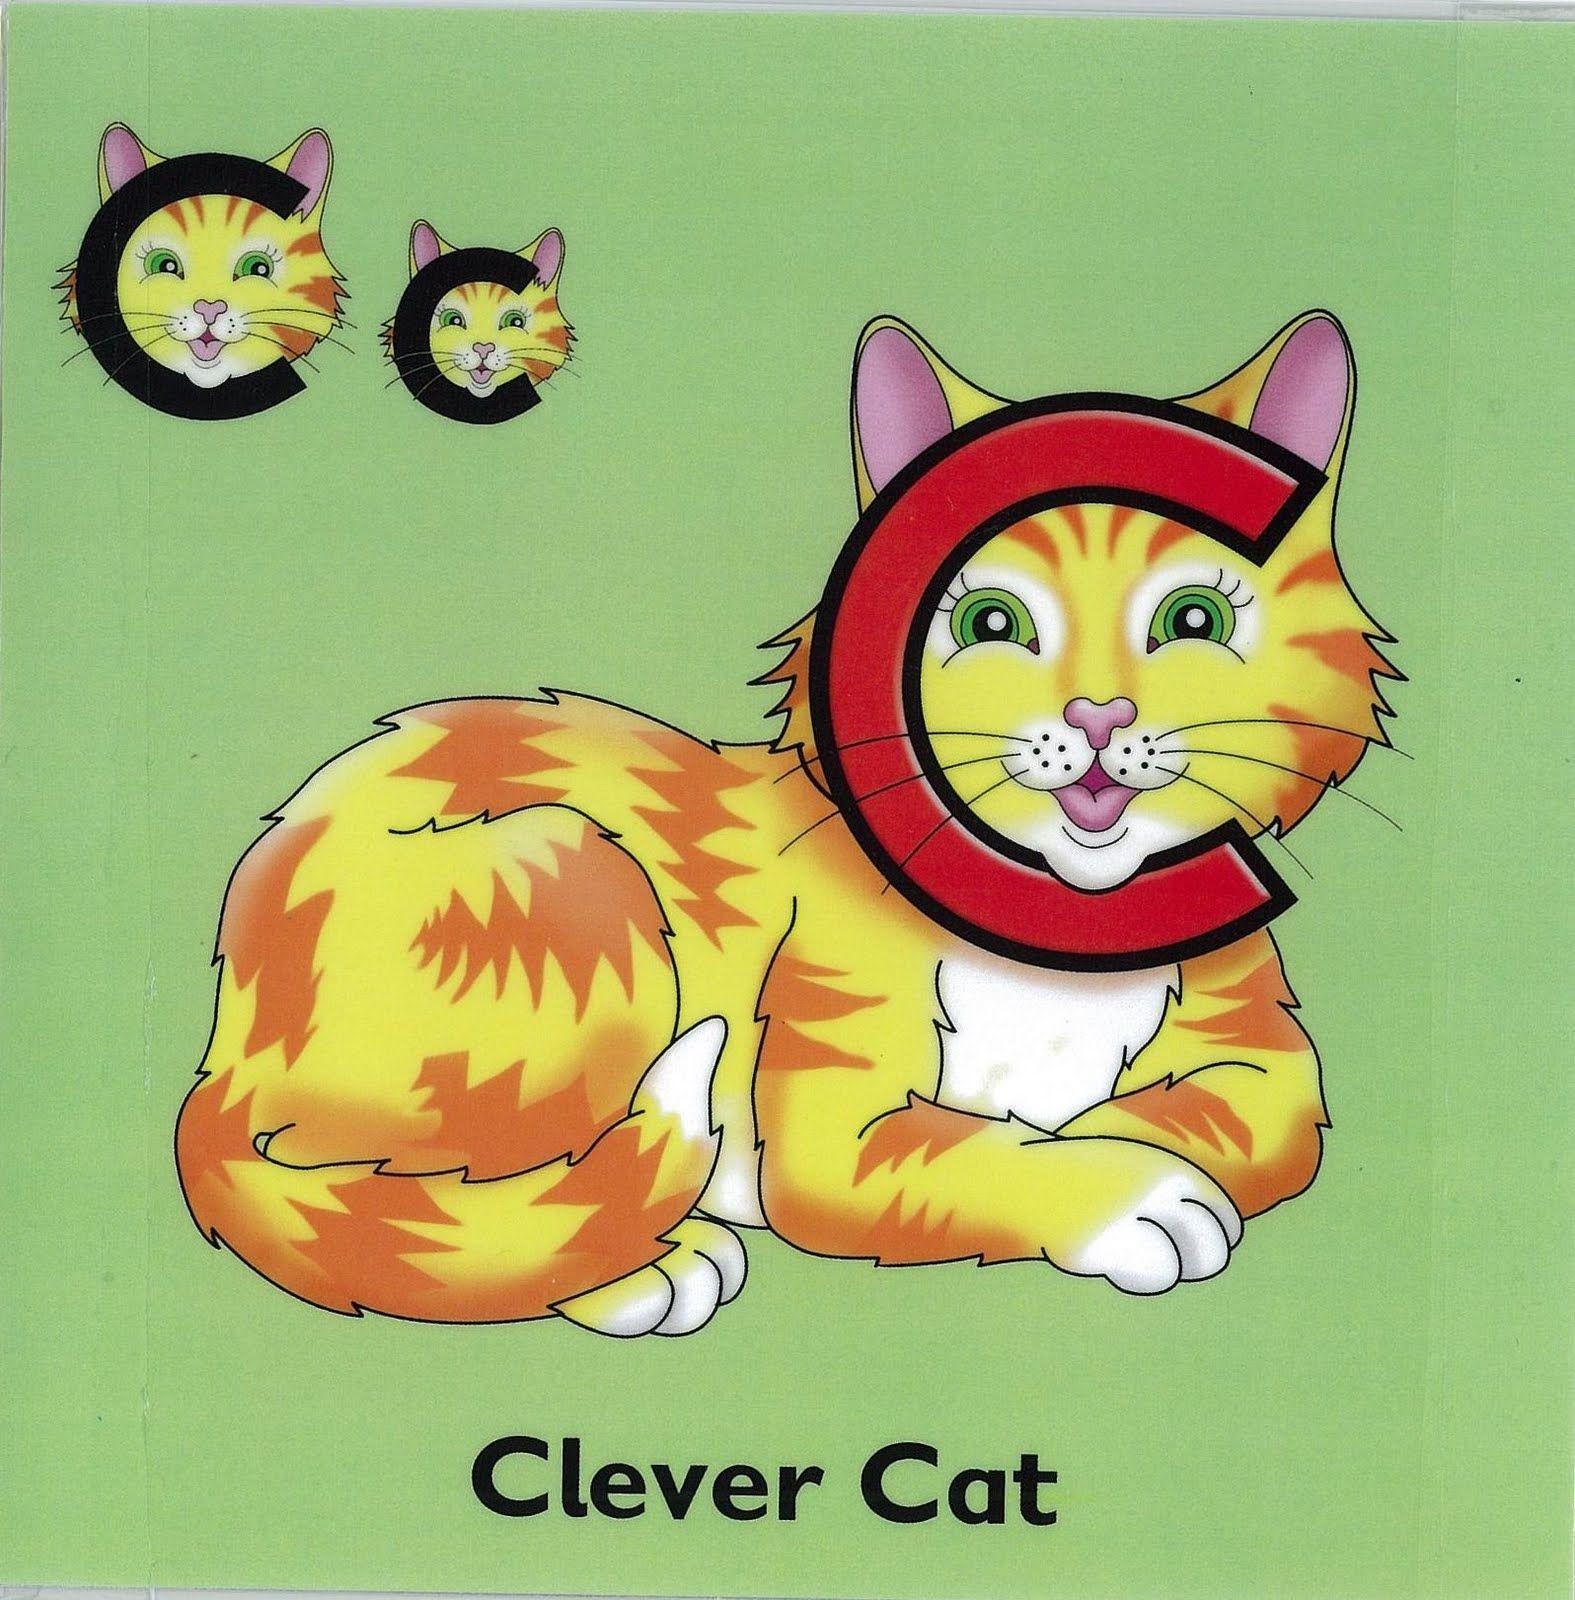 Worksheets Worksheet On Letter Land Song letterland alphabet songs pinterest phonics clever cat from letterland